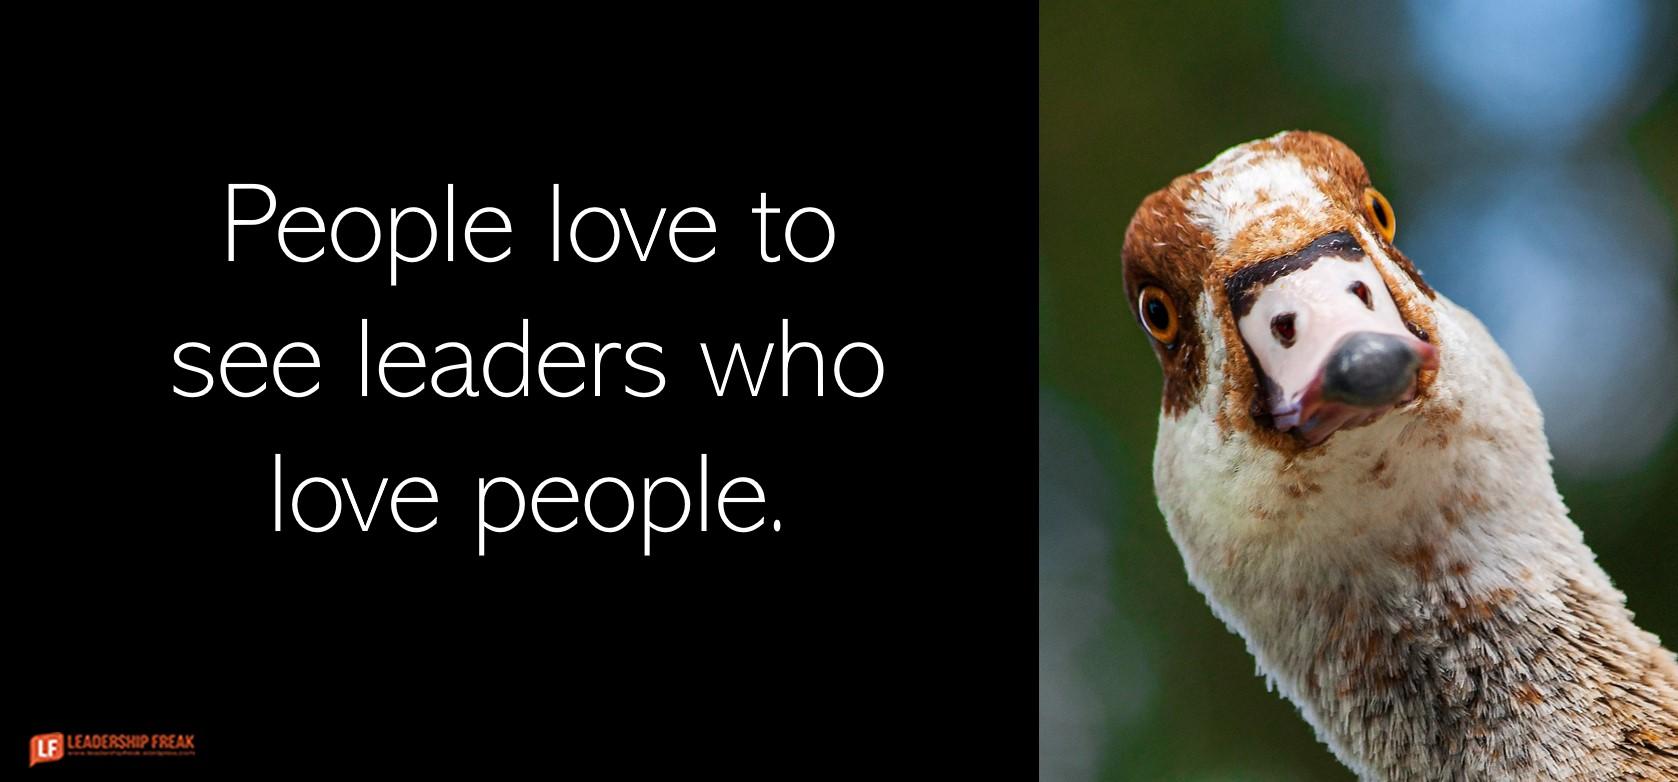 Goose  People love to see leaders who love people.